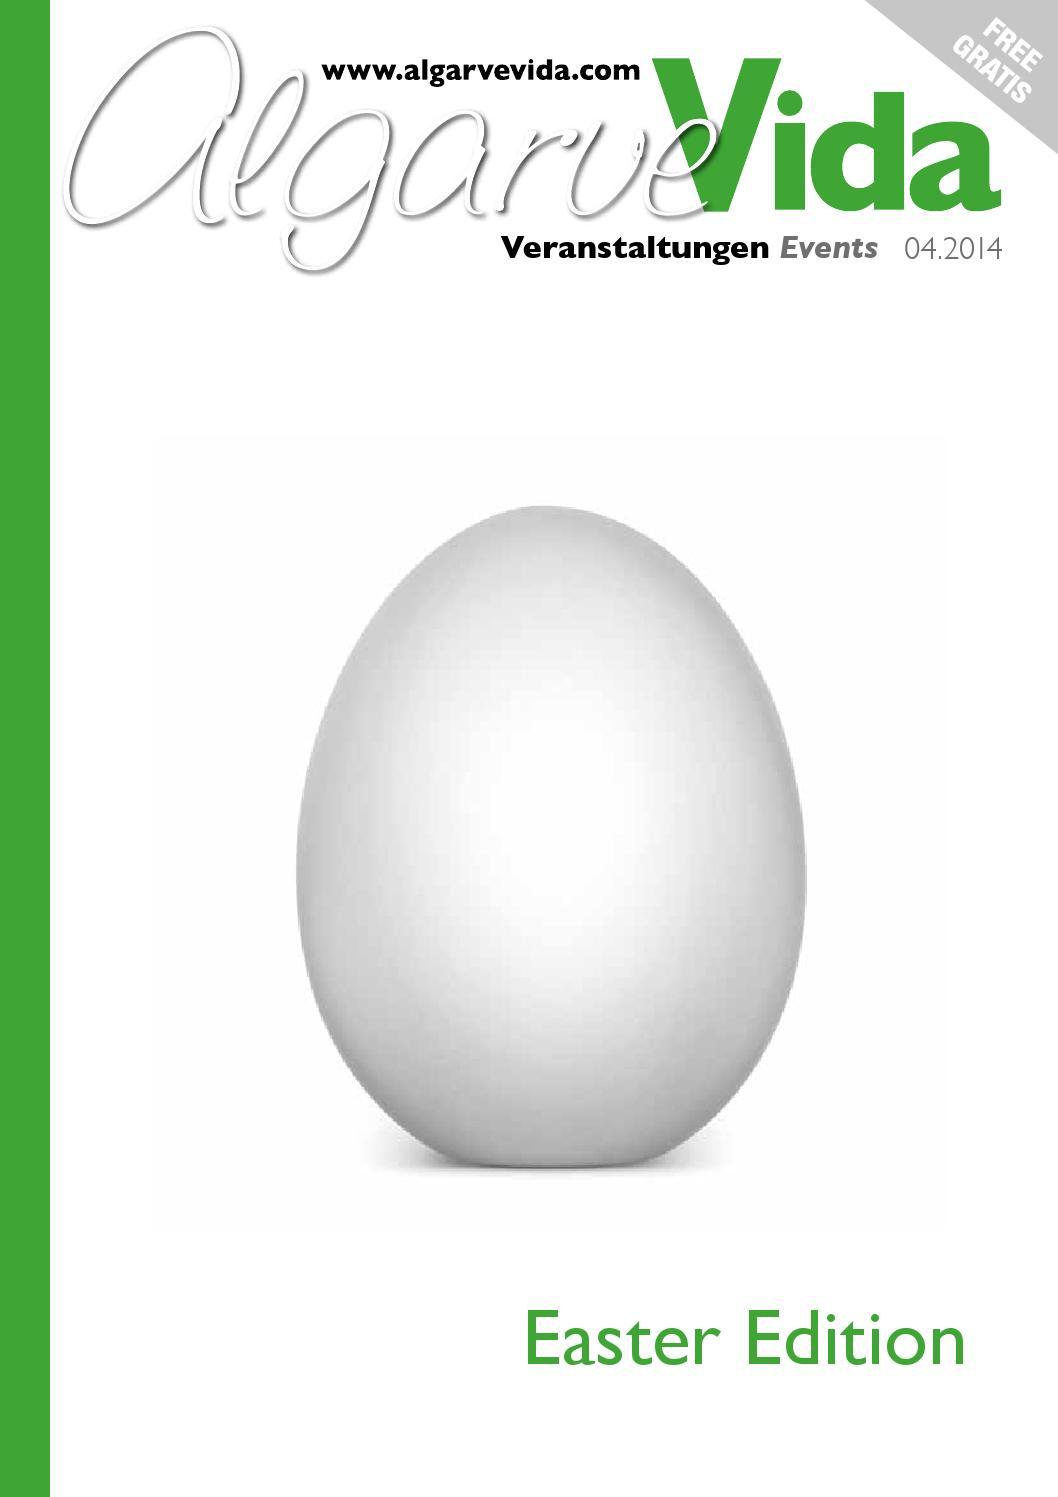 algarve vida 04/2014 by algarve vida - issuu